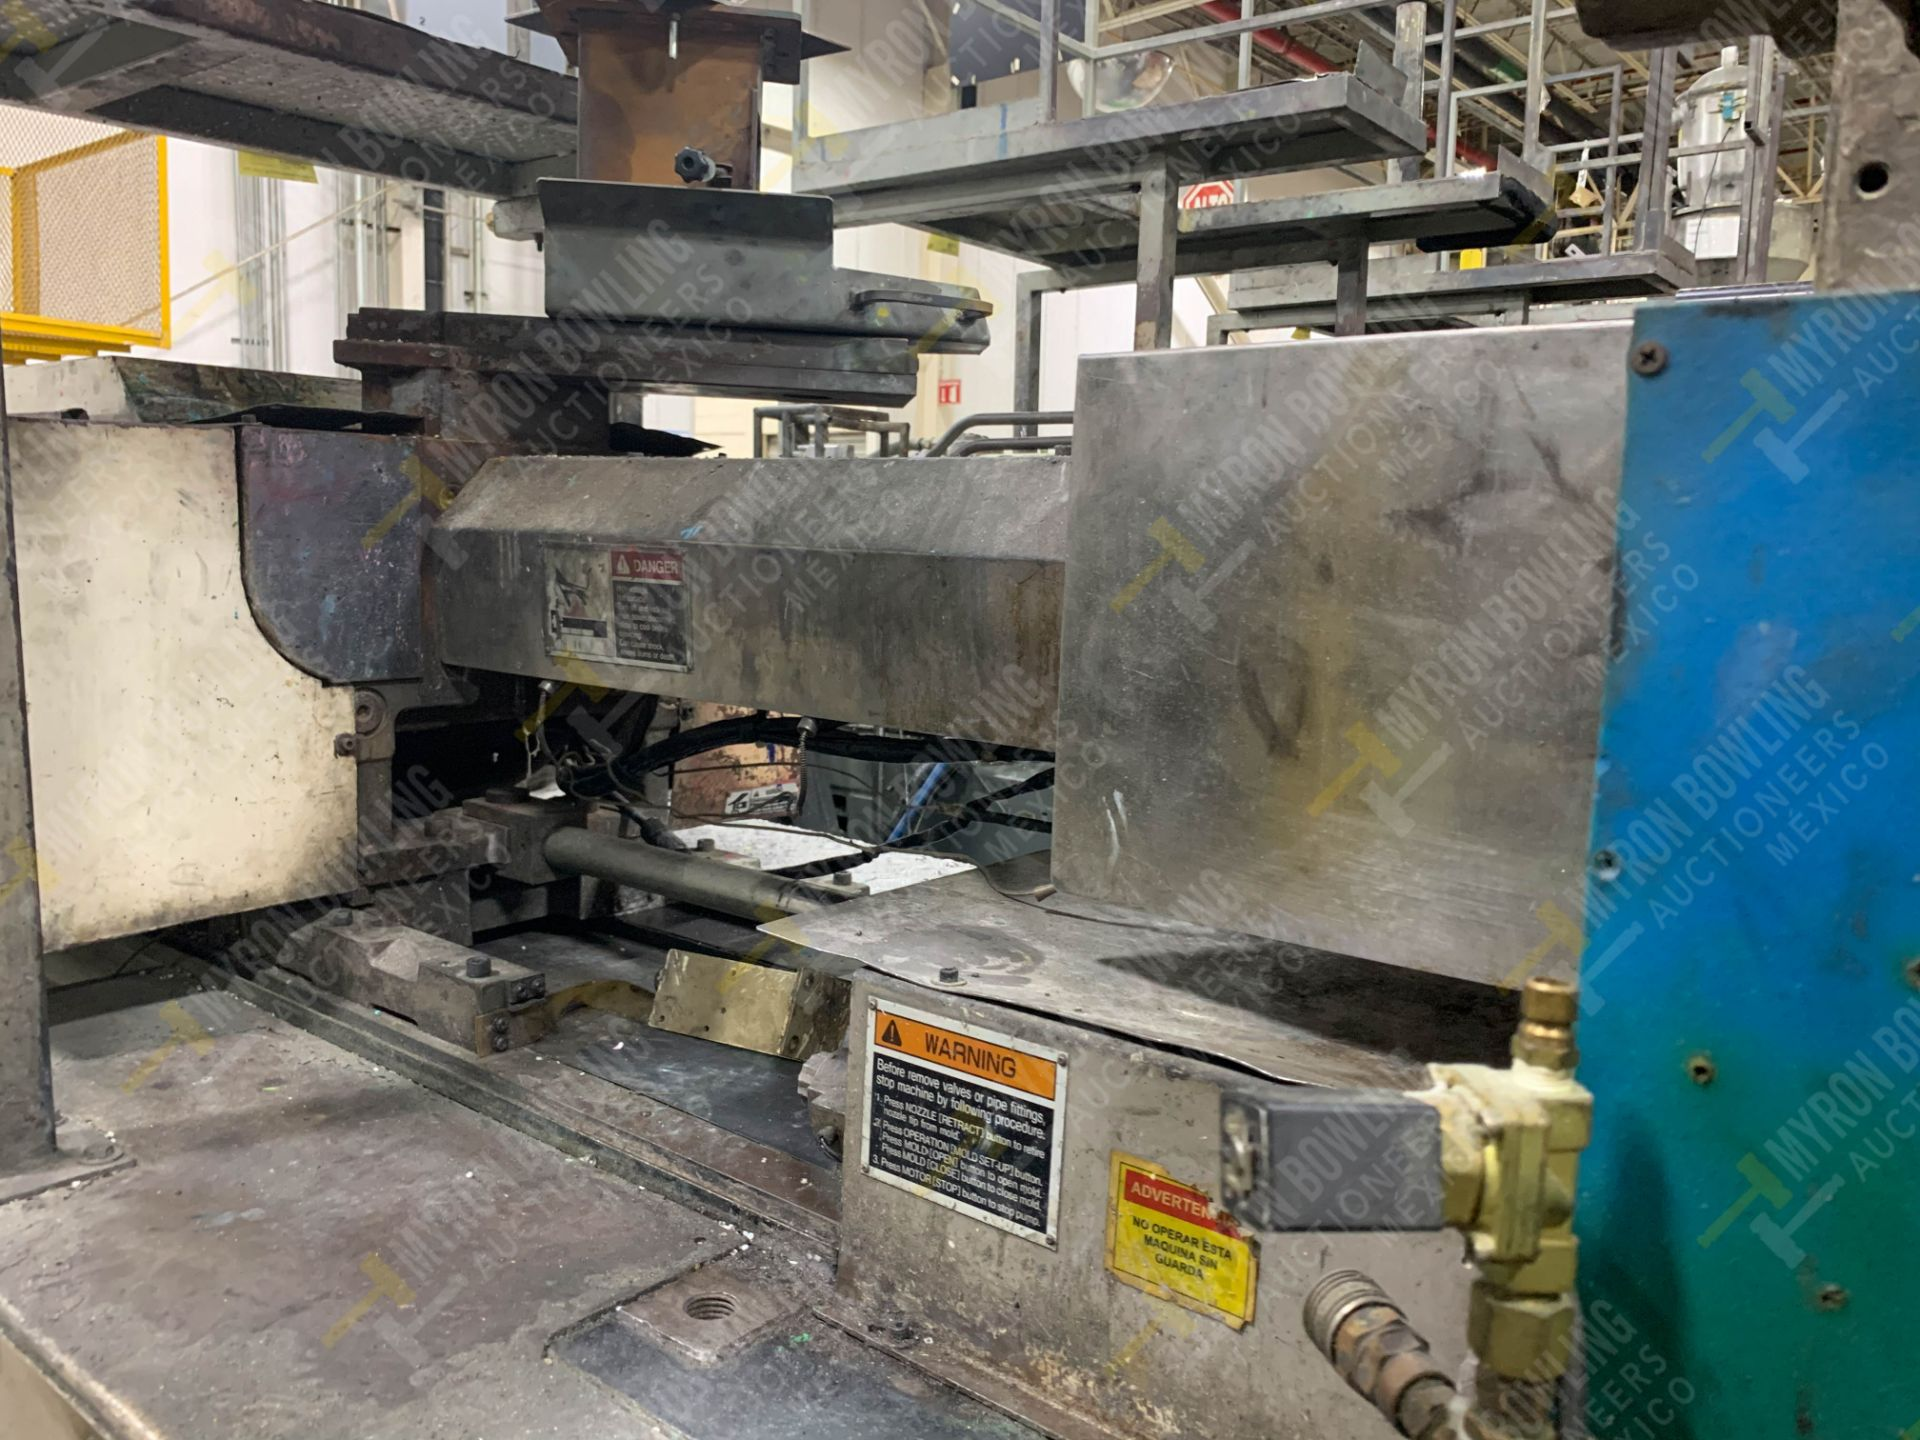 Lot 3 - 150 TON TOSHIBA ISG150NV10-7A PLASTIC INJECTION MOLDING MACHINE.